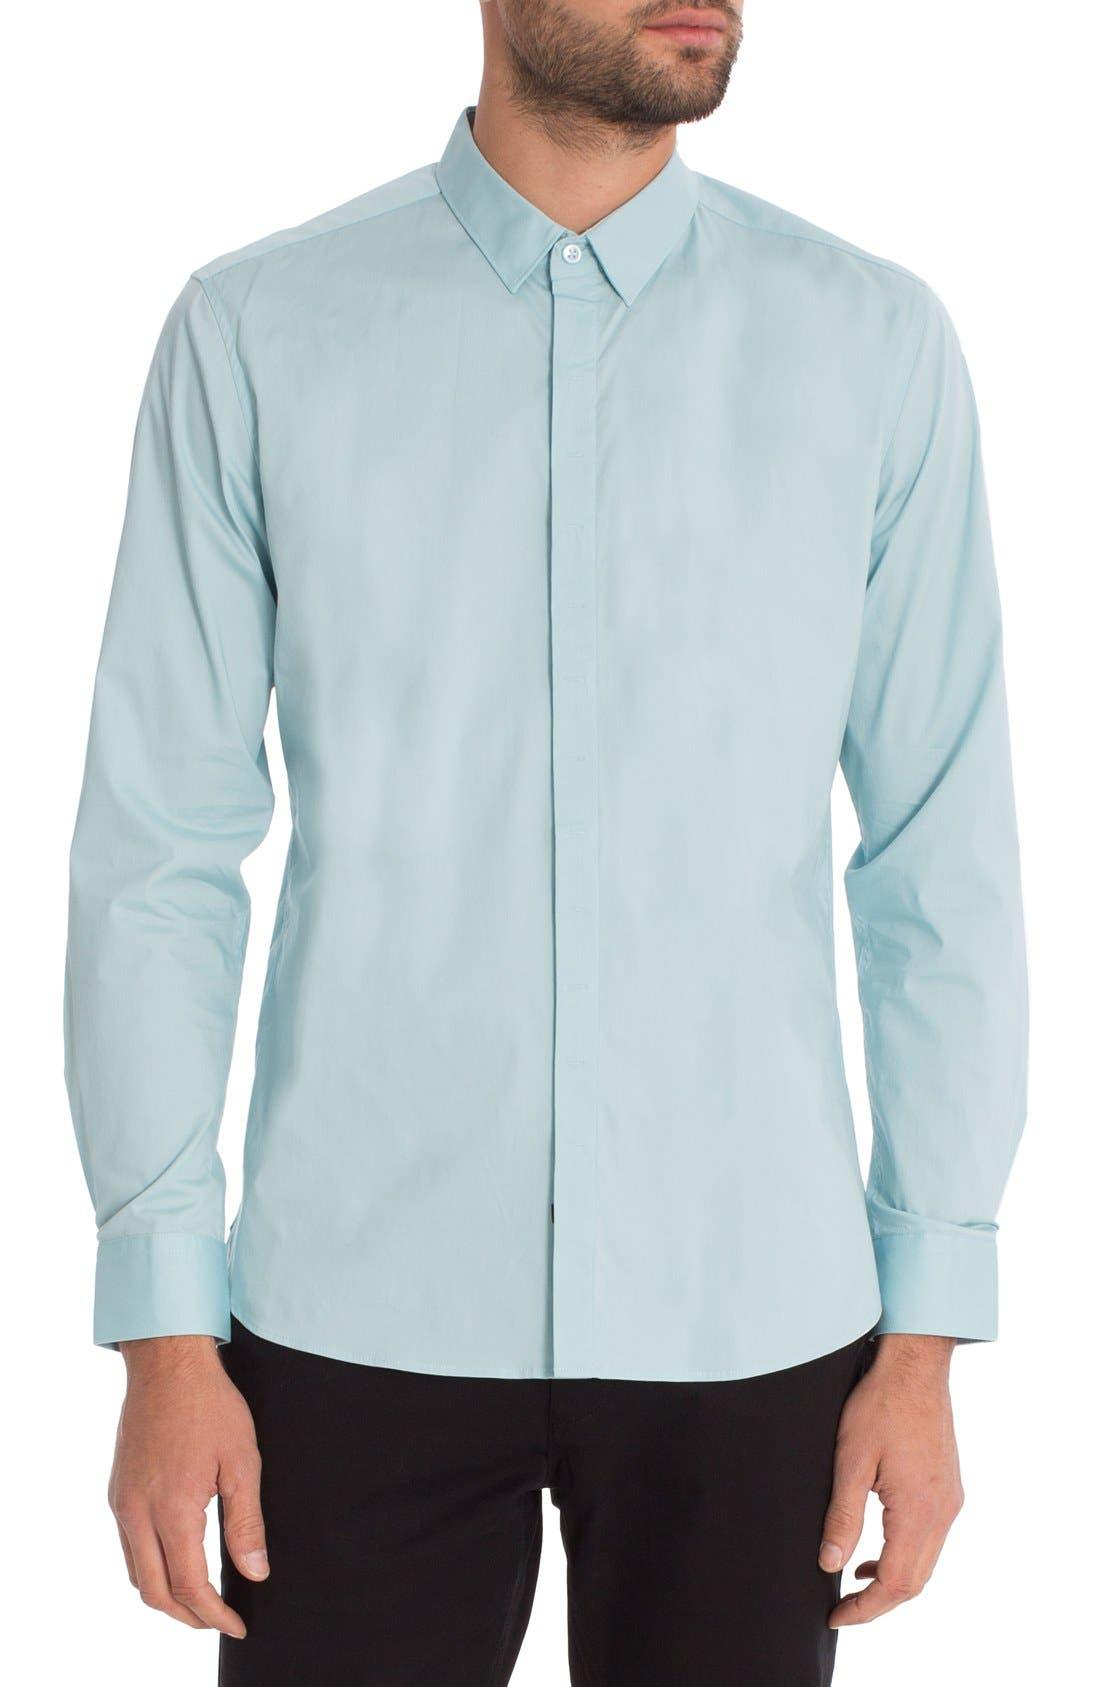 'Peace Train' Trim Fit Woven Shirt,                             Main thumbnail 4, color,